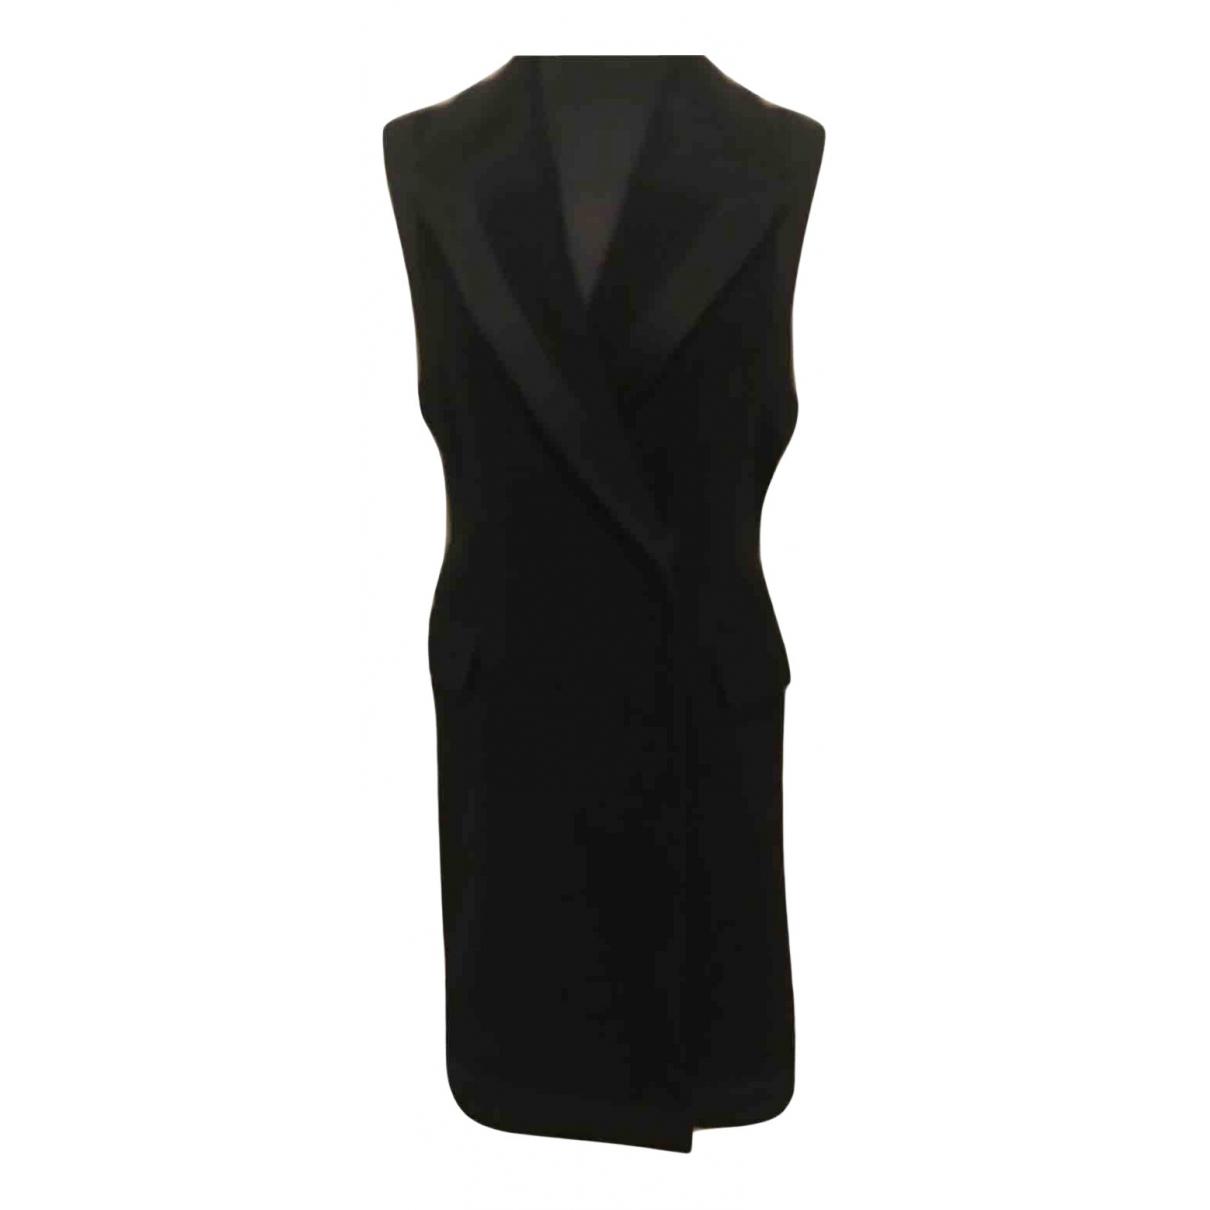 Bcbg Max Azria N Black Wool dress for Women 2 US